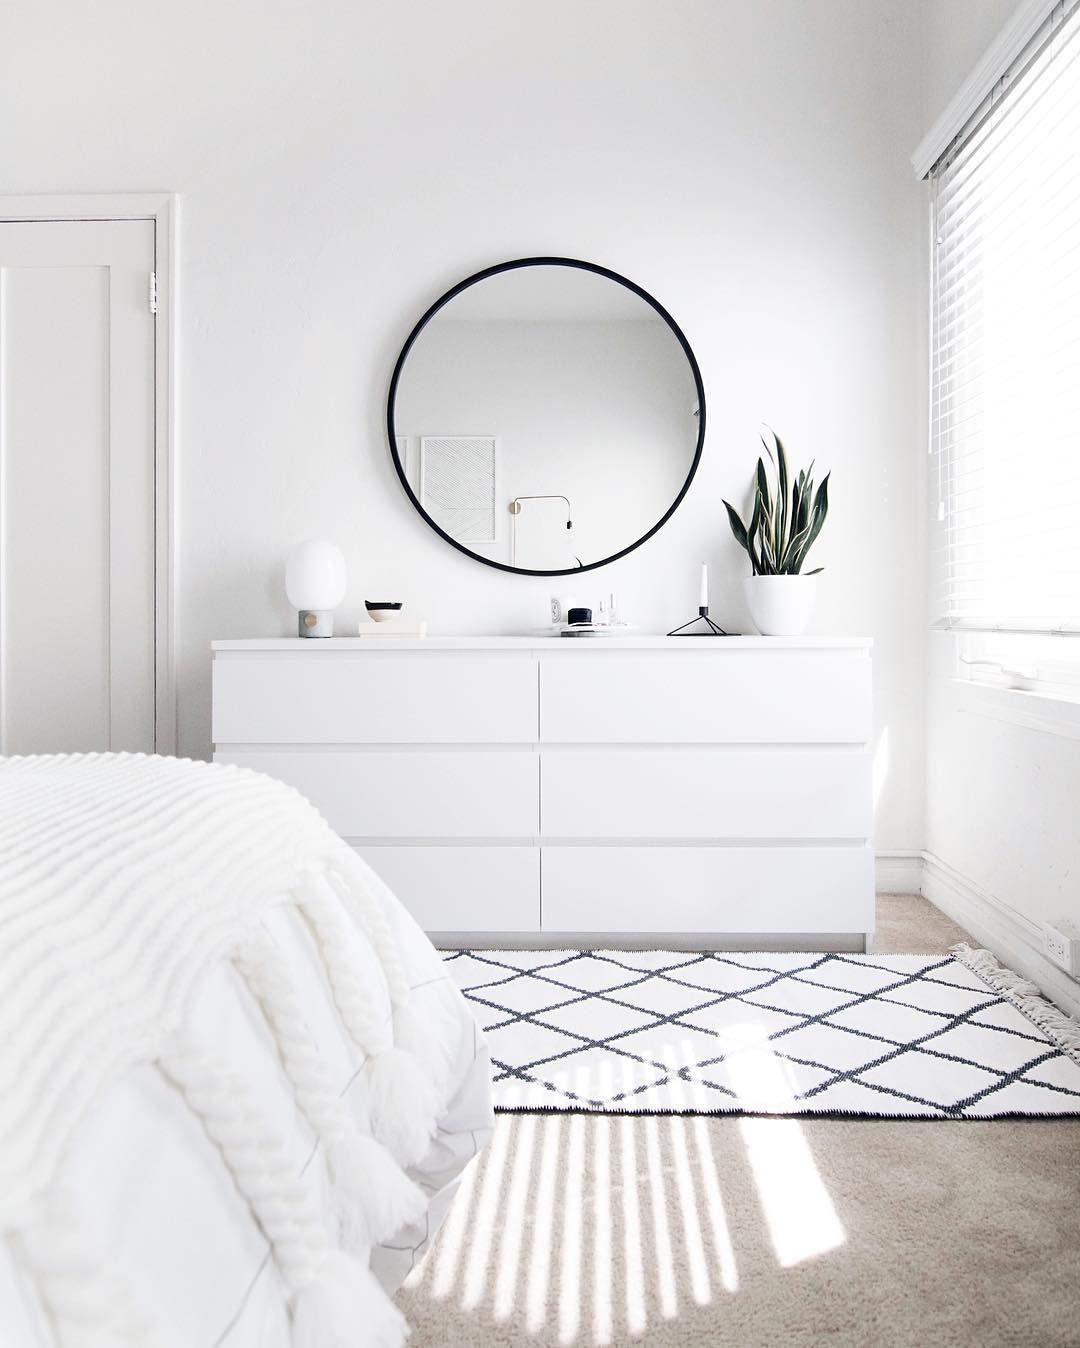 Dekorera ett Zen-sovrum – Inspirerande bilder